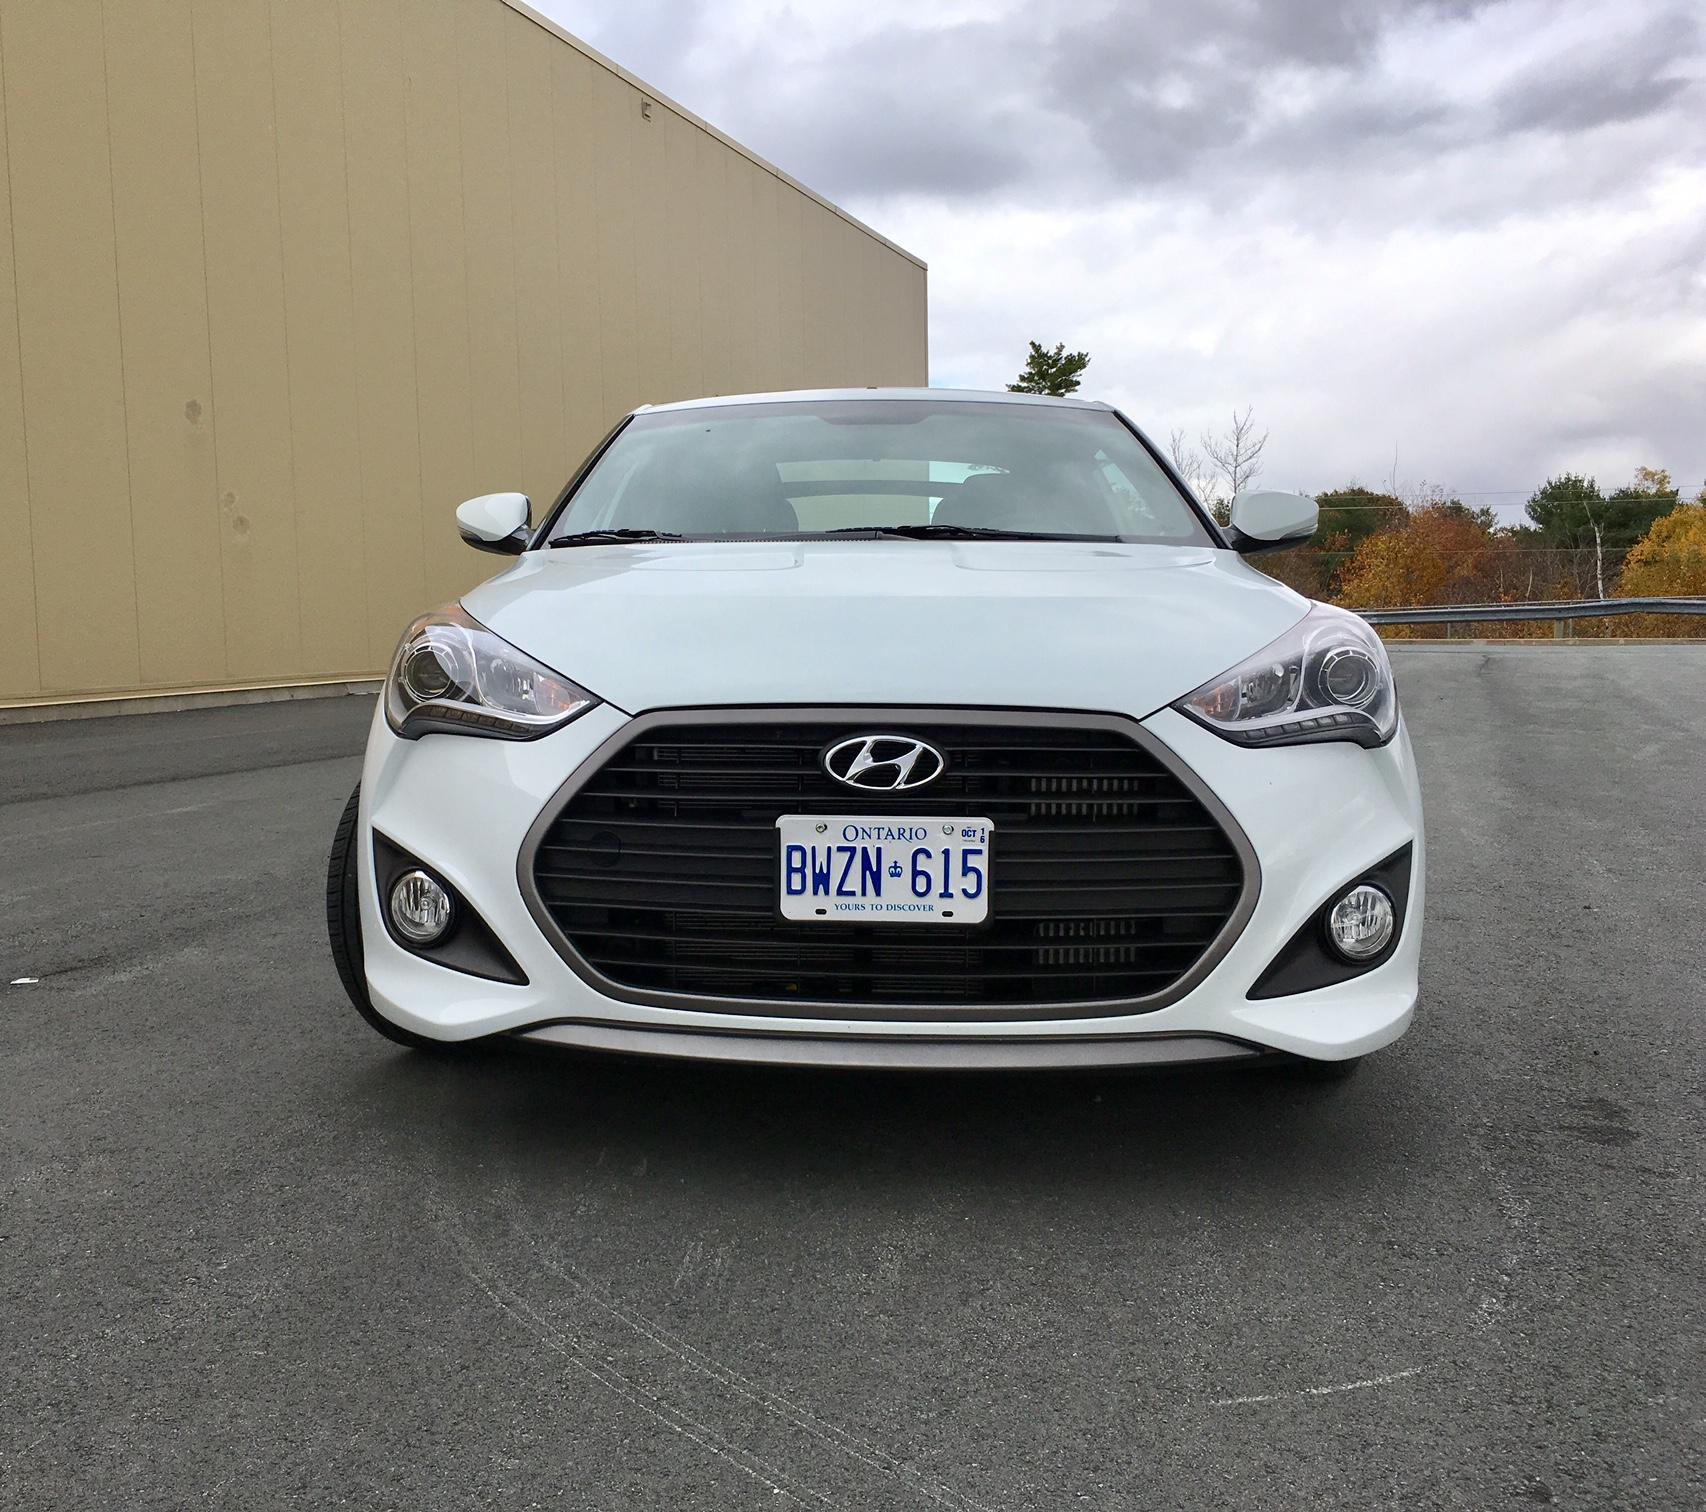 Hyundai Veloster Turbo Used: Test Drive: 2016 Hyundai Veloster Turbo